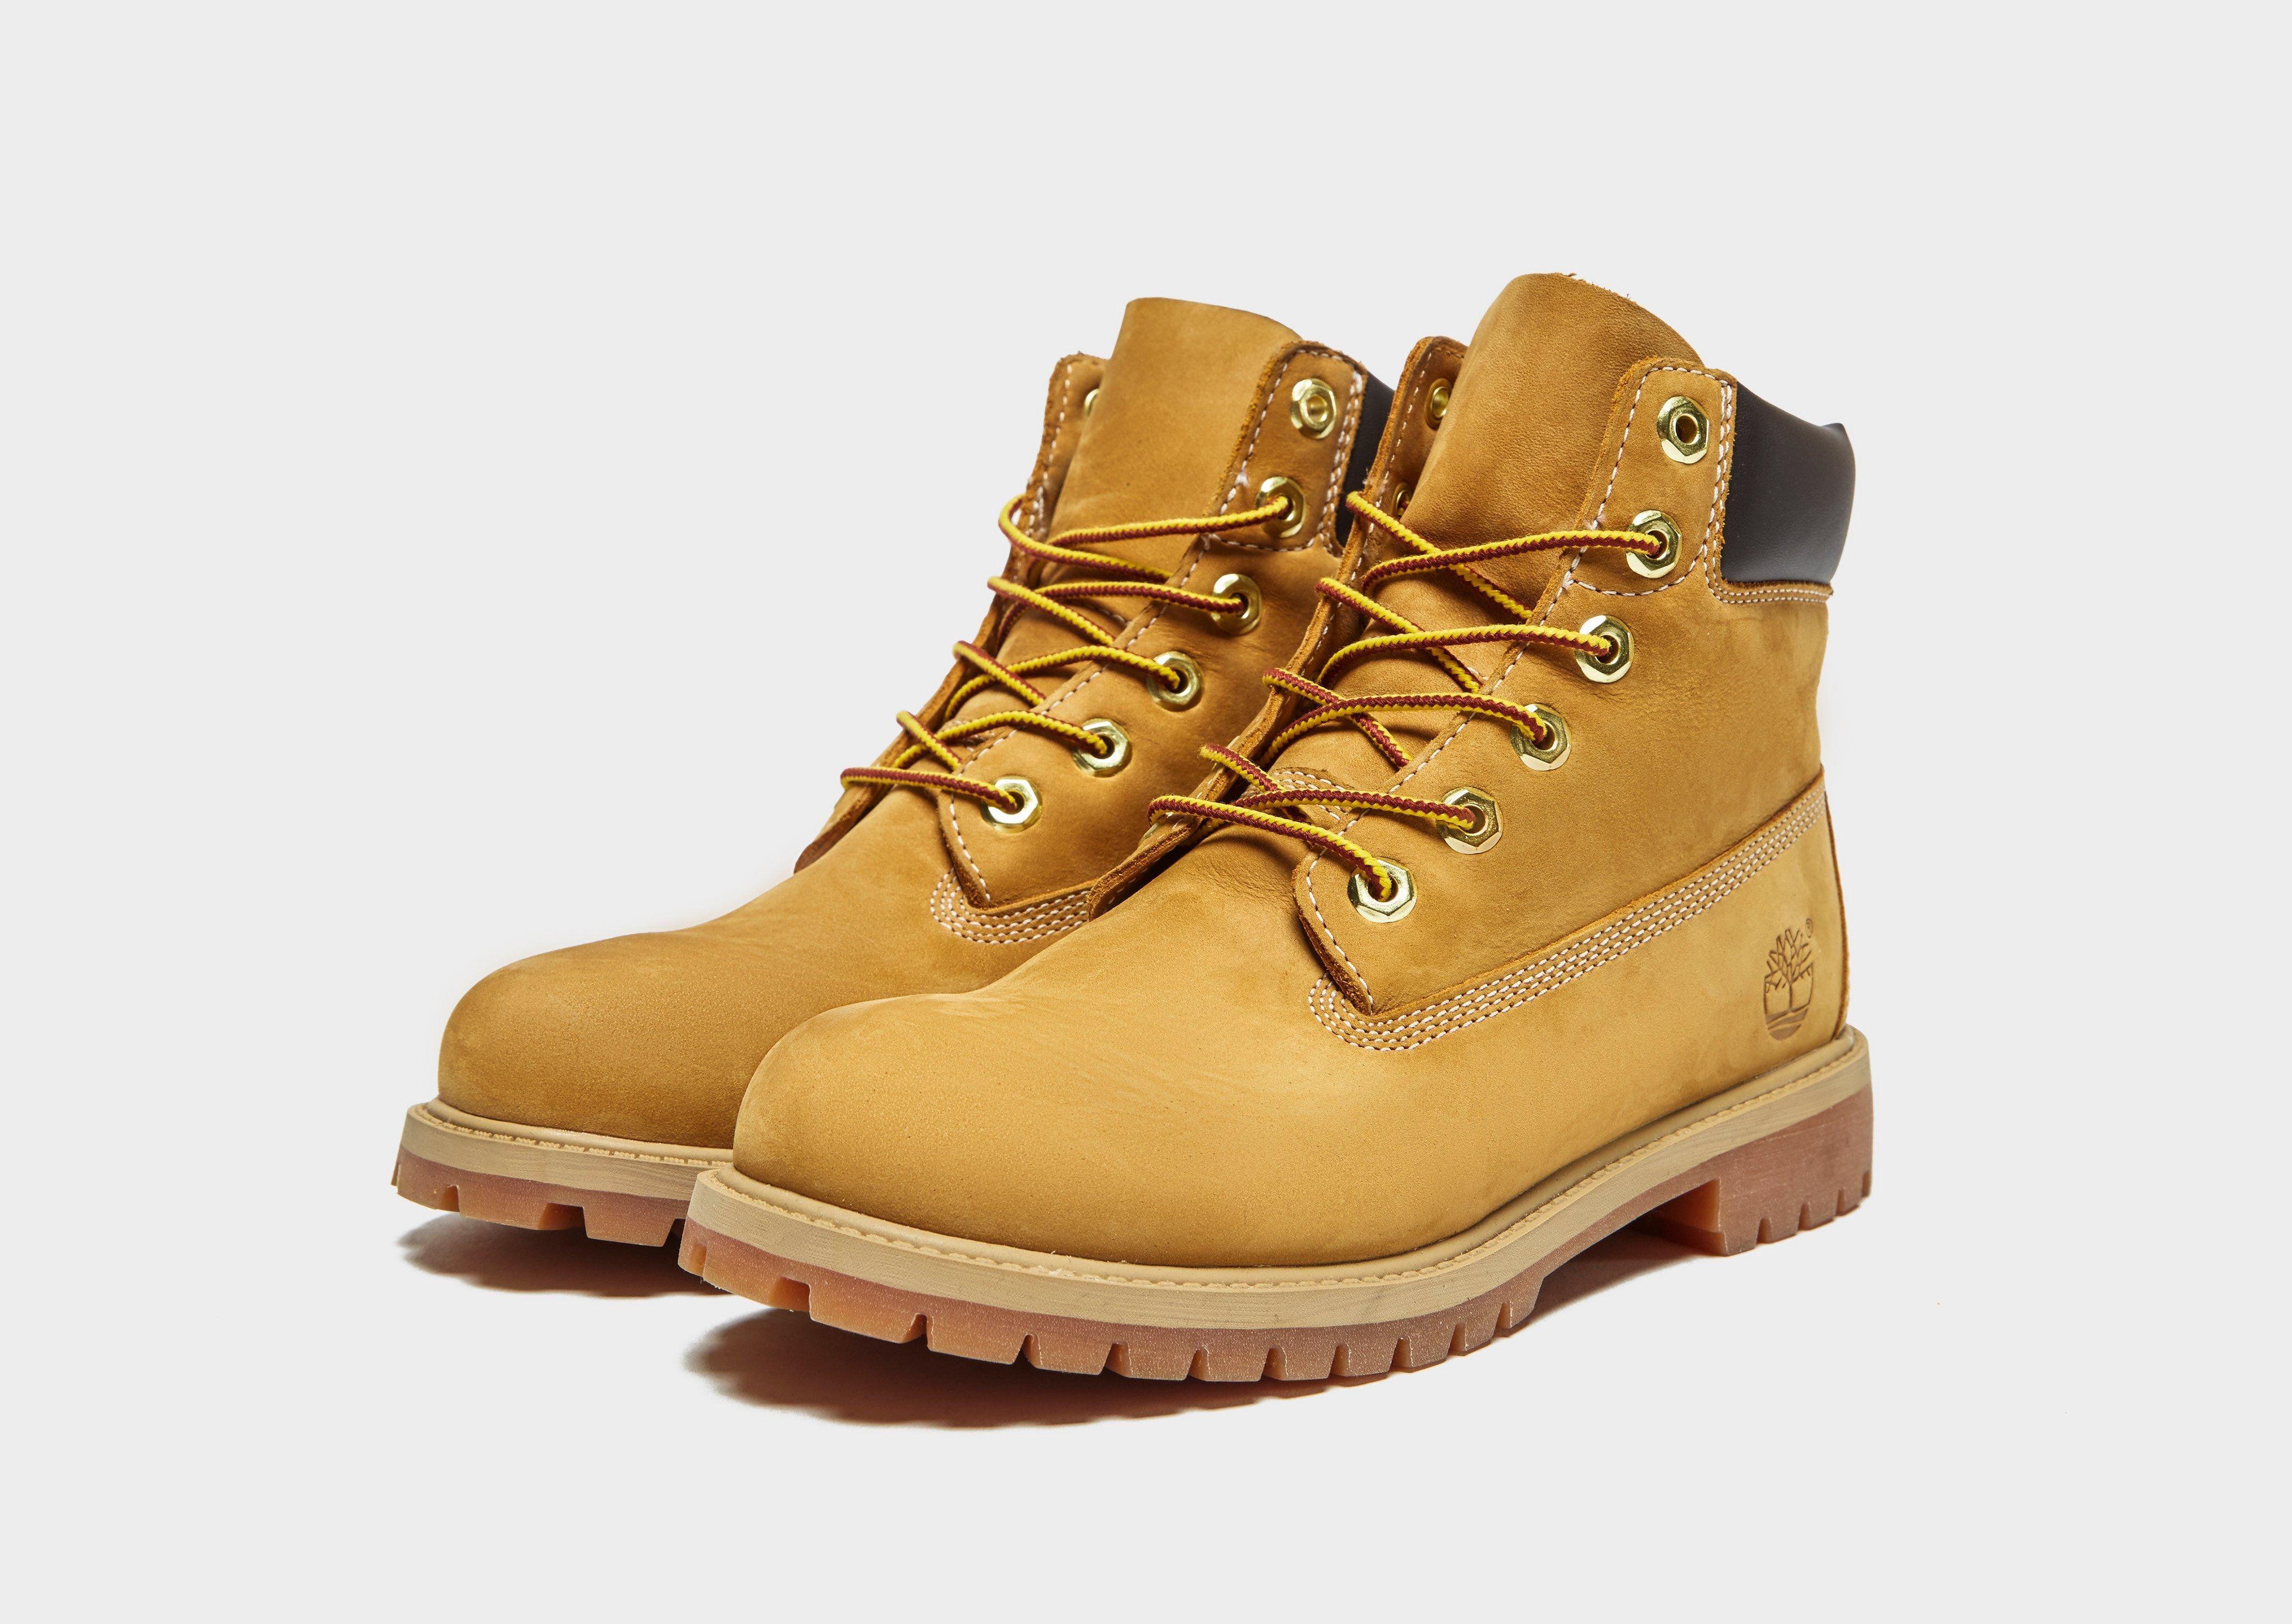 Timberland 6 Inch Boot Junior